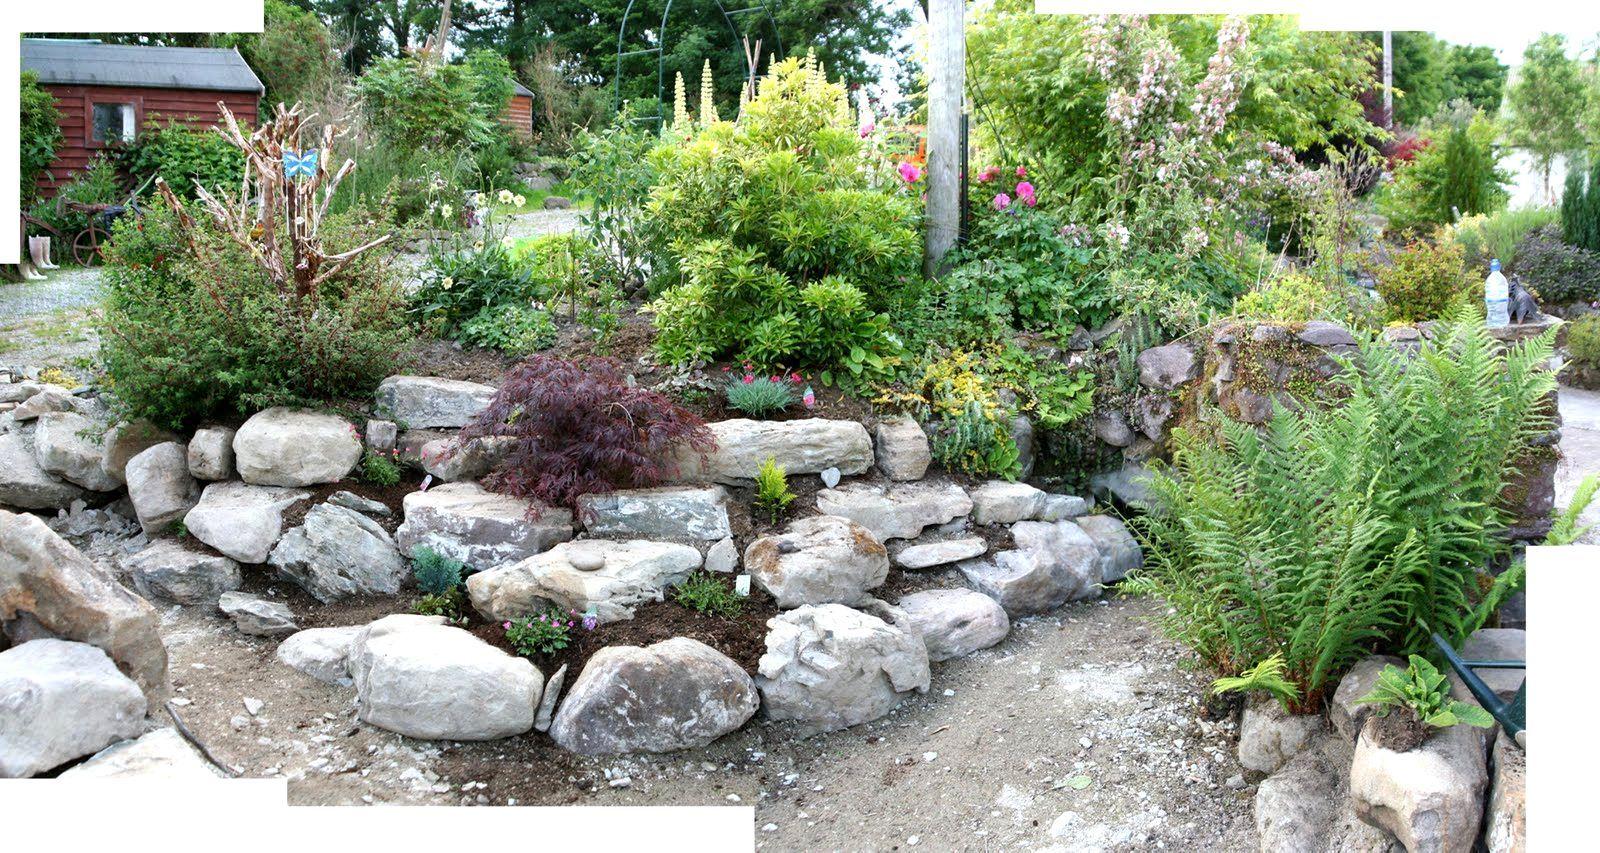 Rockery Ideas For Small Gardens Google Search Rockery Garden Small Gardens Small Garden Rocks